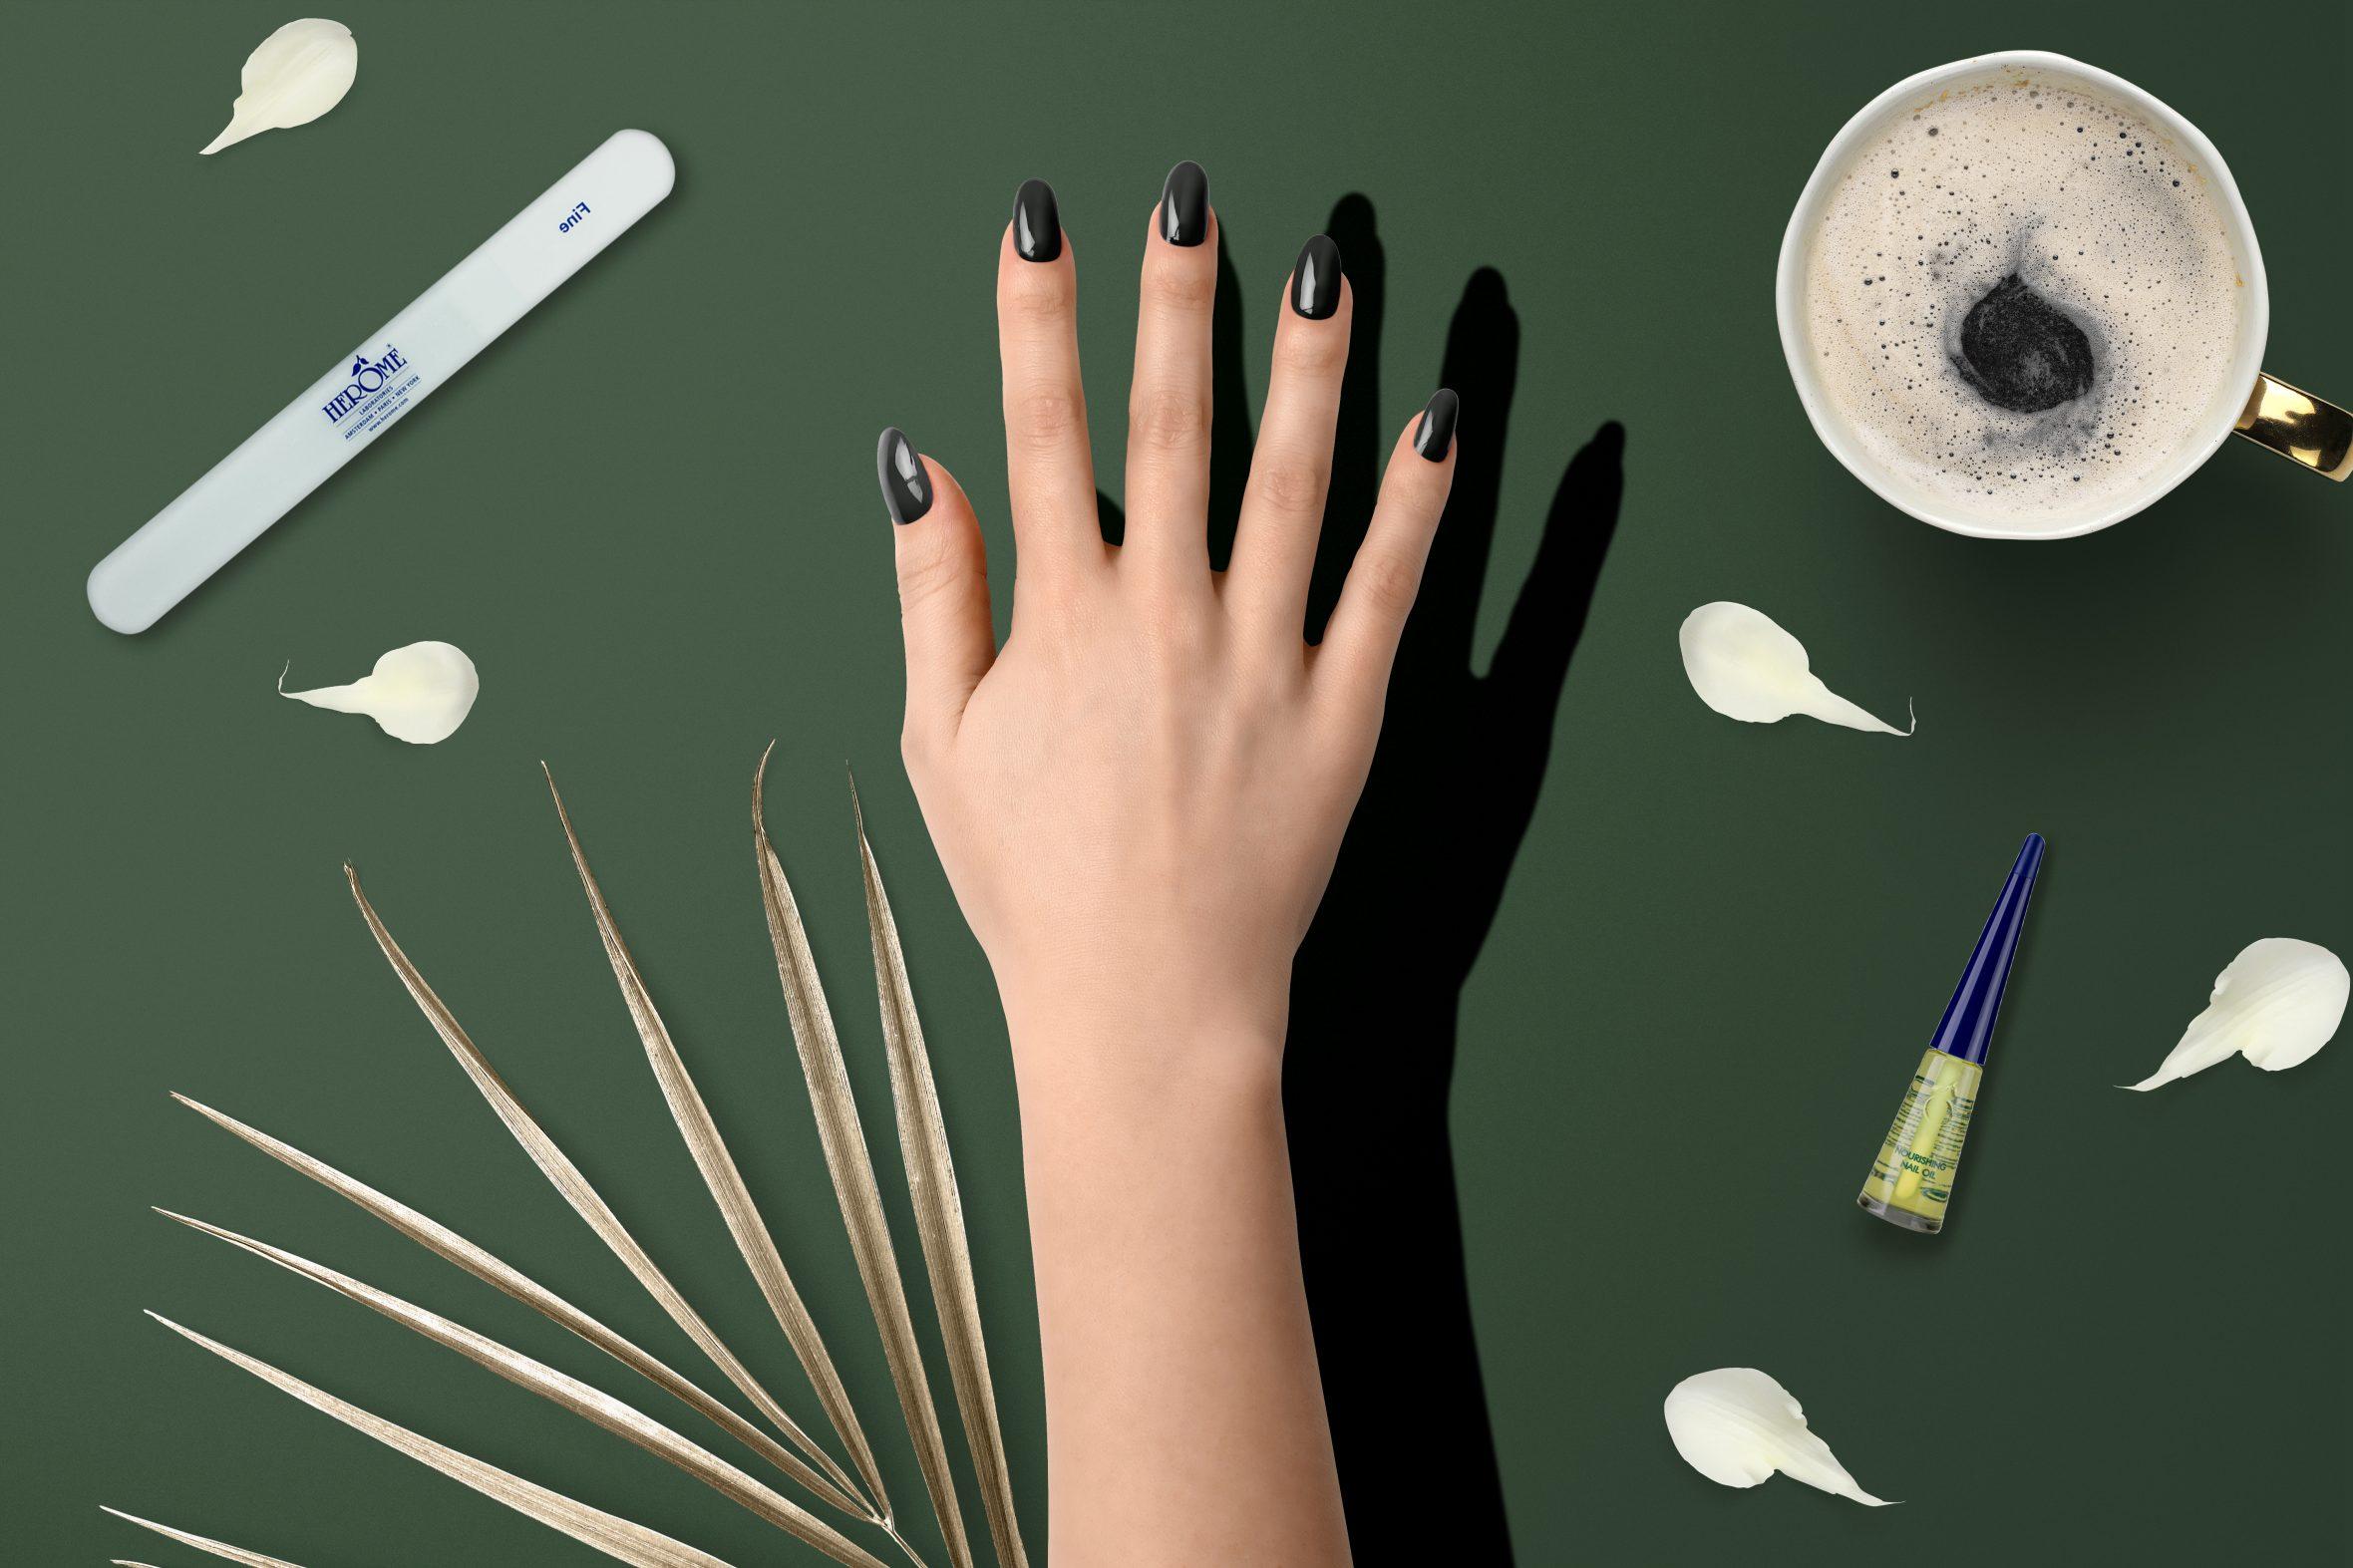 donkergroene nagellak kleurnummer 169 van de Herôme nagellak kleuren